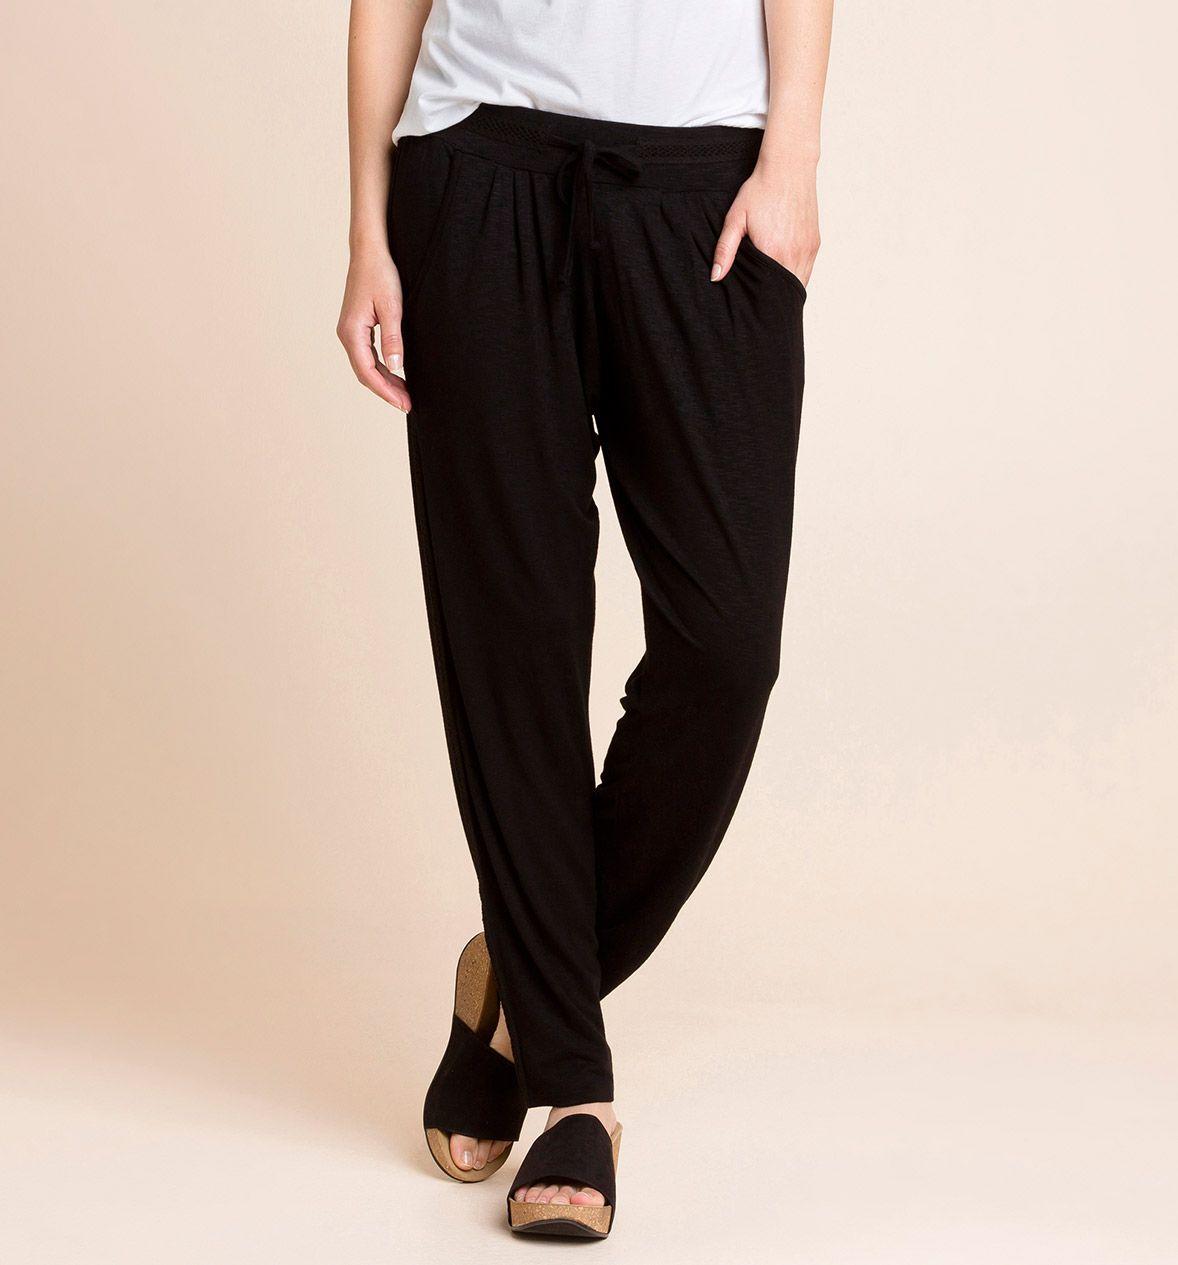 Pantalones fluidos negros